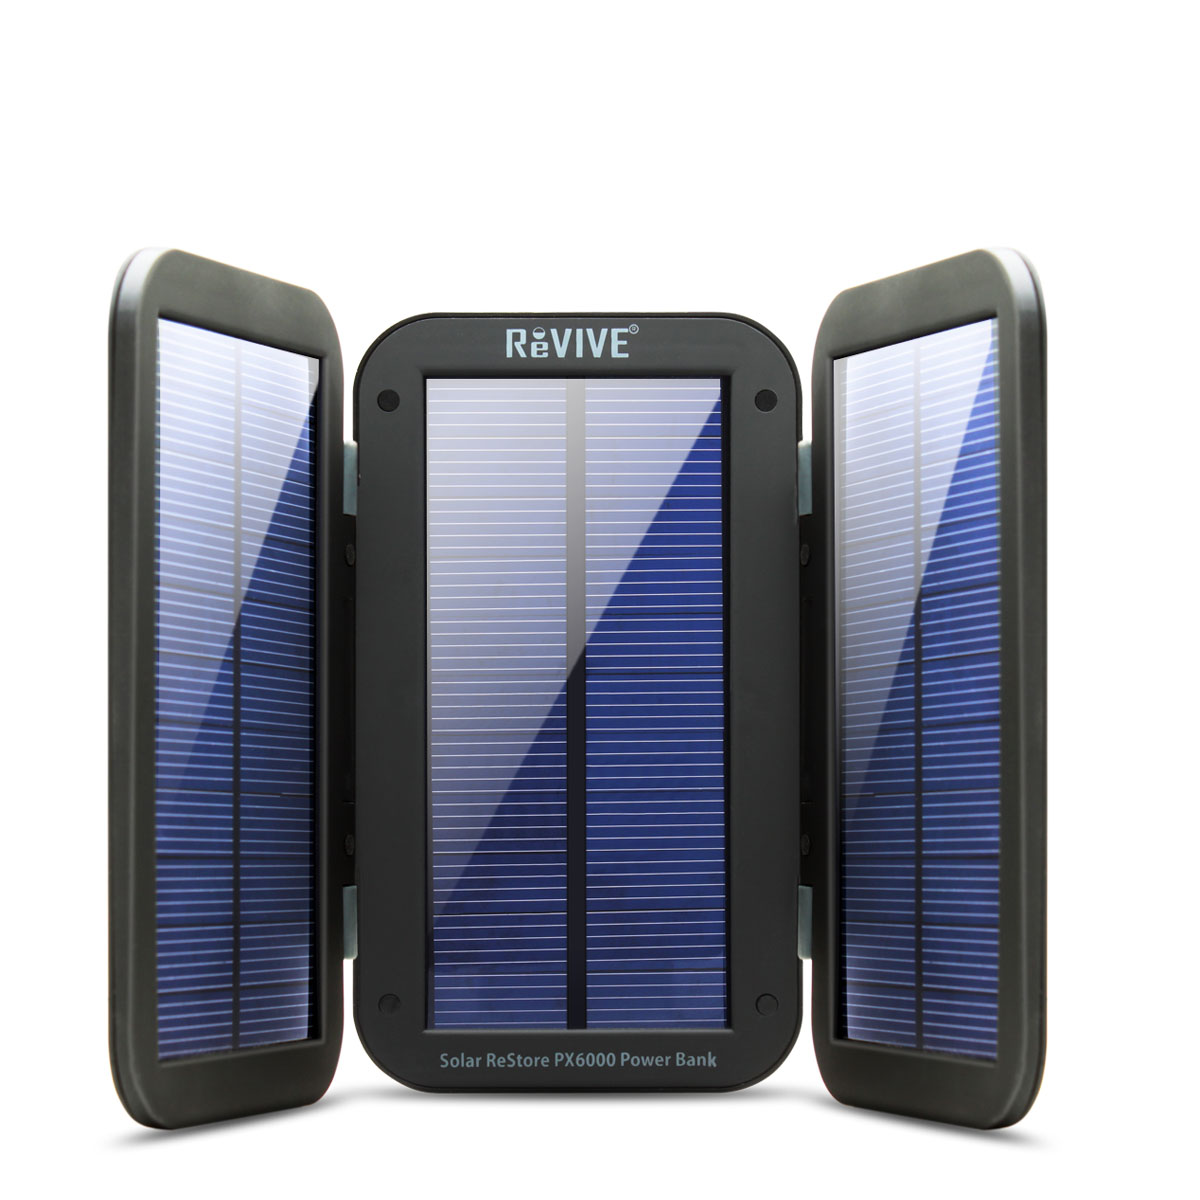 revive solar restore px6000 power bank charger usb. Black Bedroom Furniture Sets. Home Design Ideas